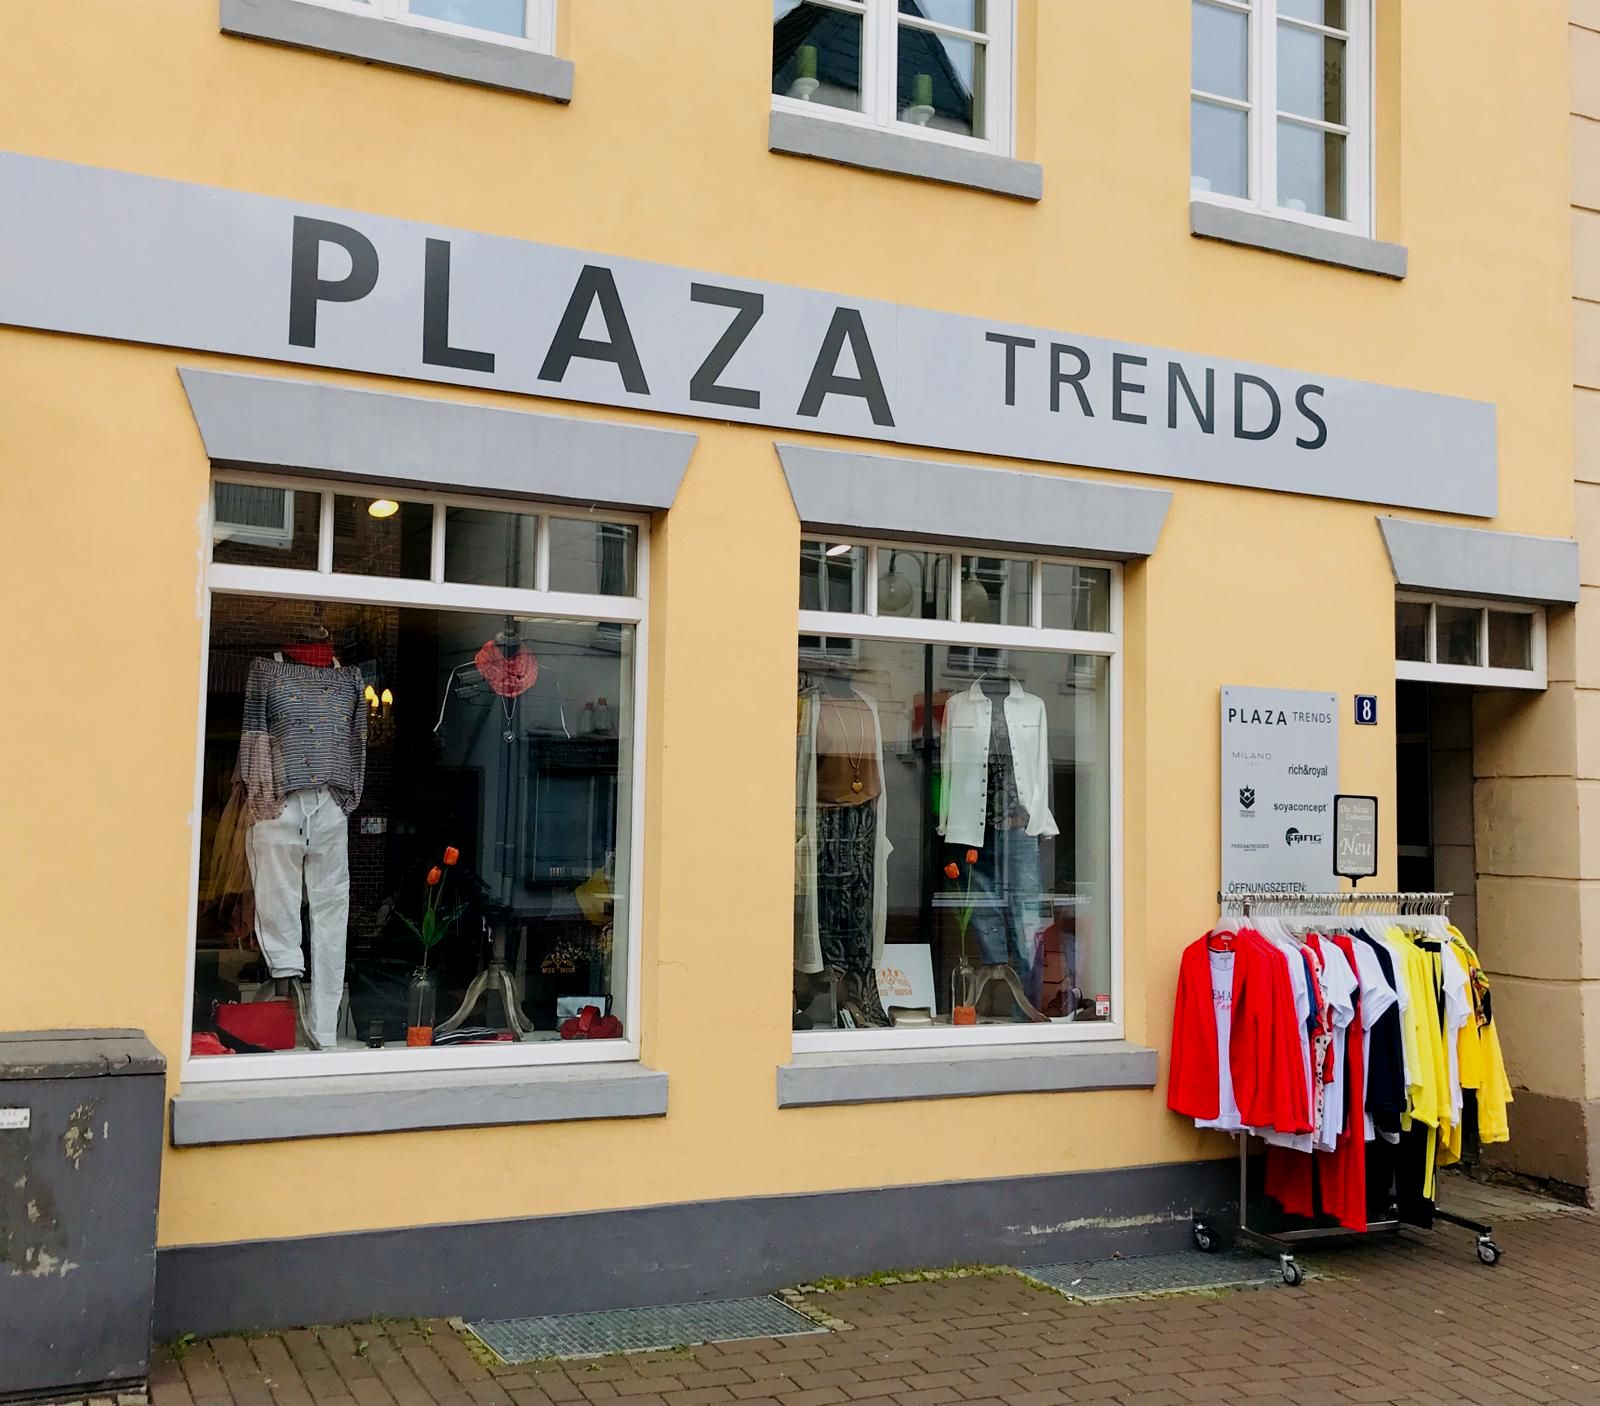 Plaza Trends (Fürstenau)